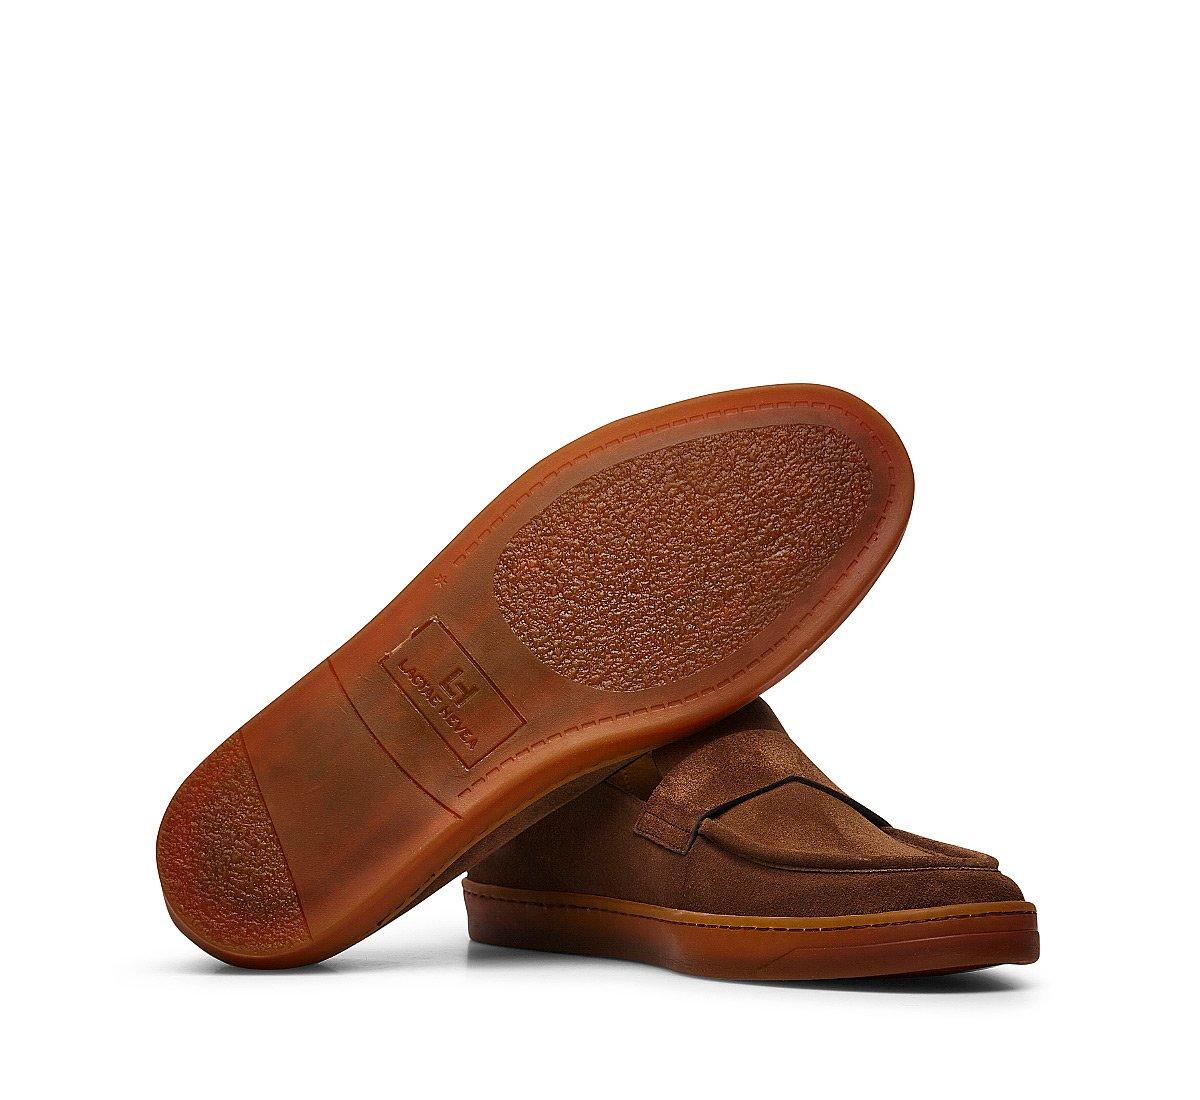 Online exclusive - Suede calfskin moccasins